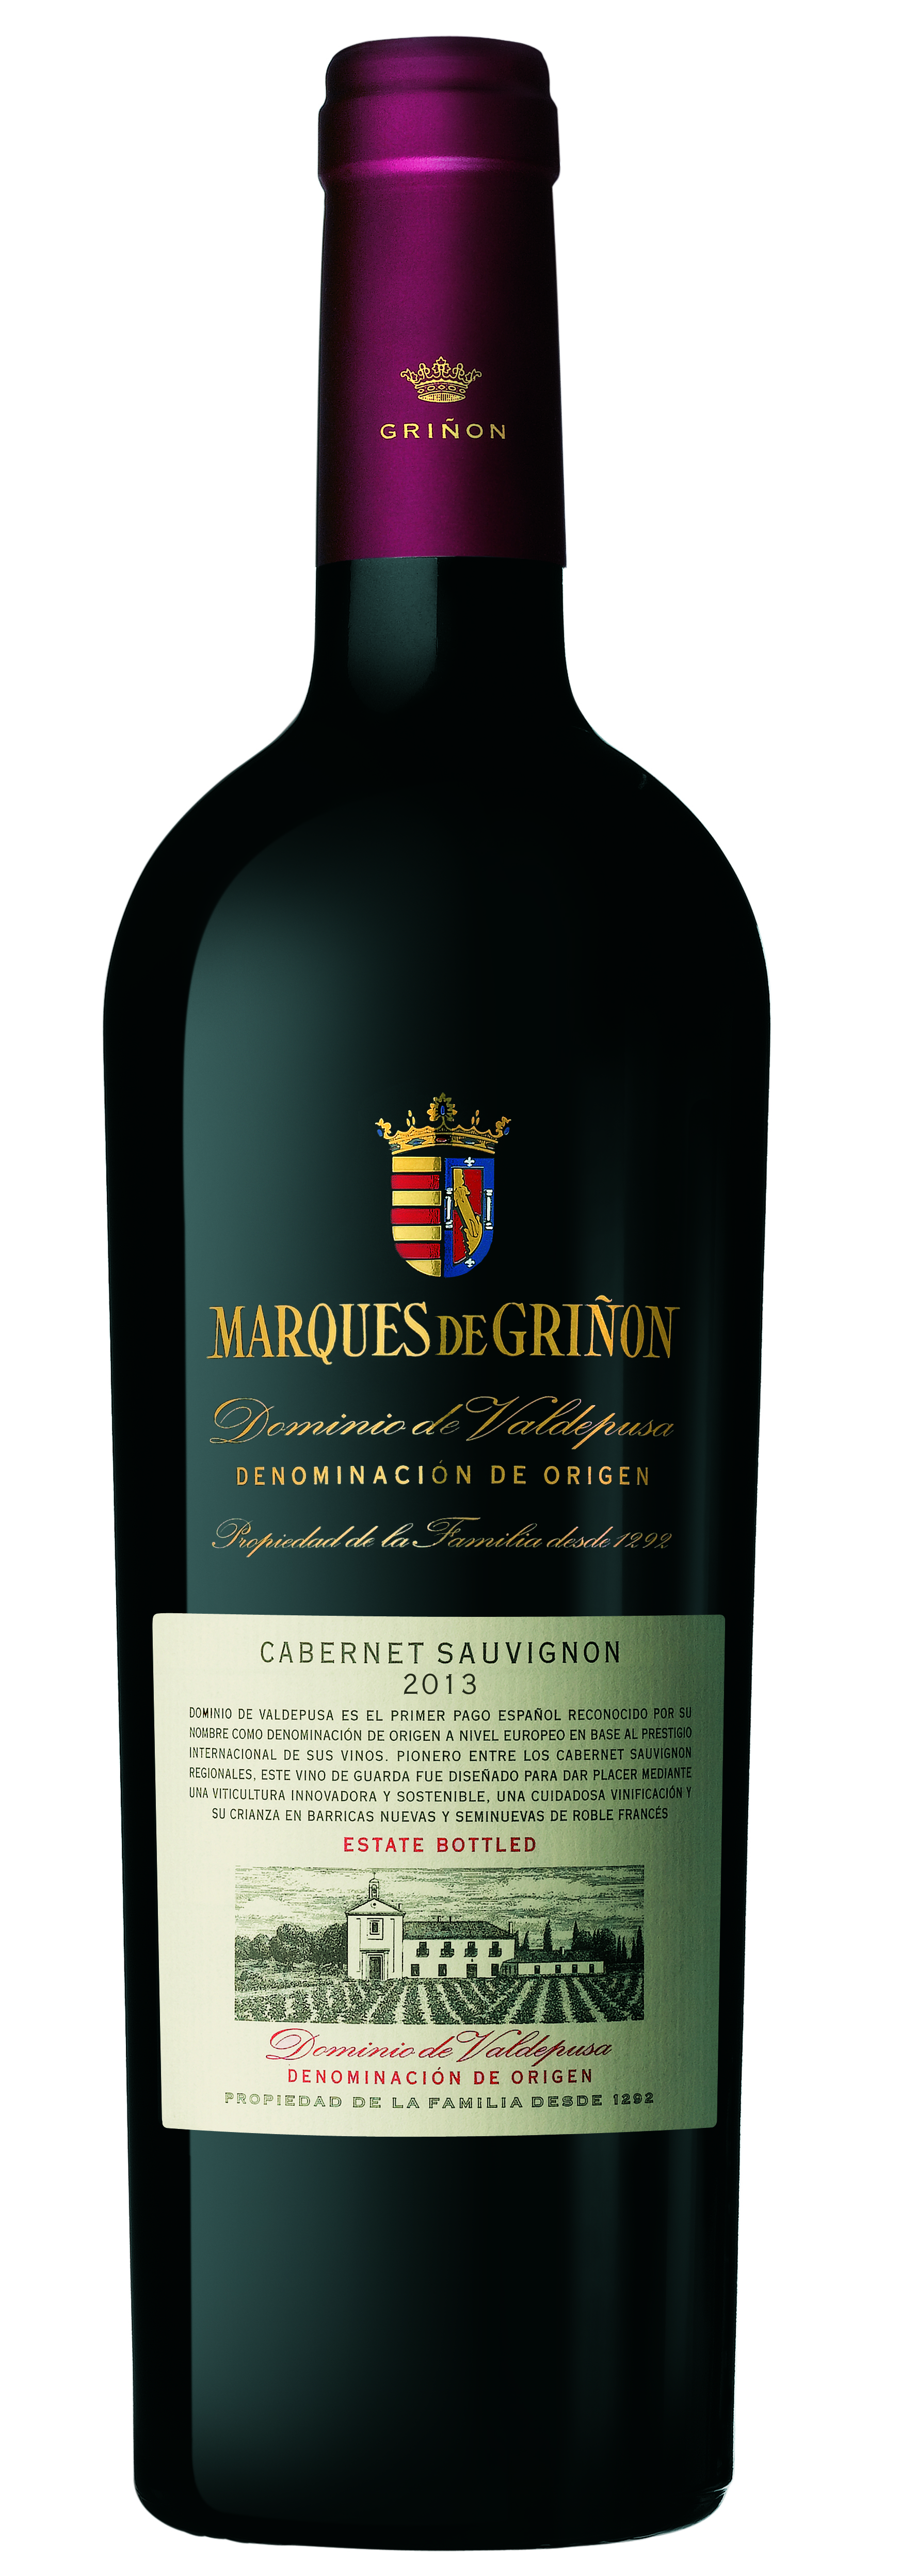 Marques de Griñon Cabernet Sauvignon